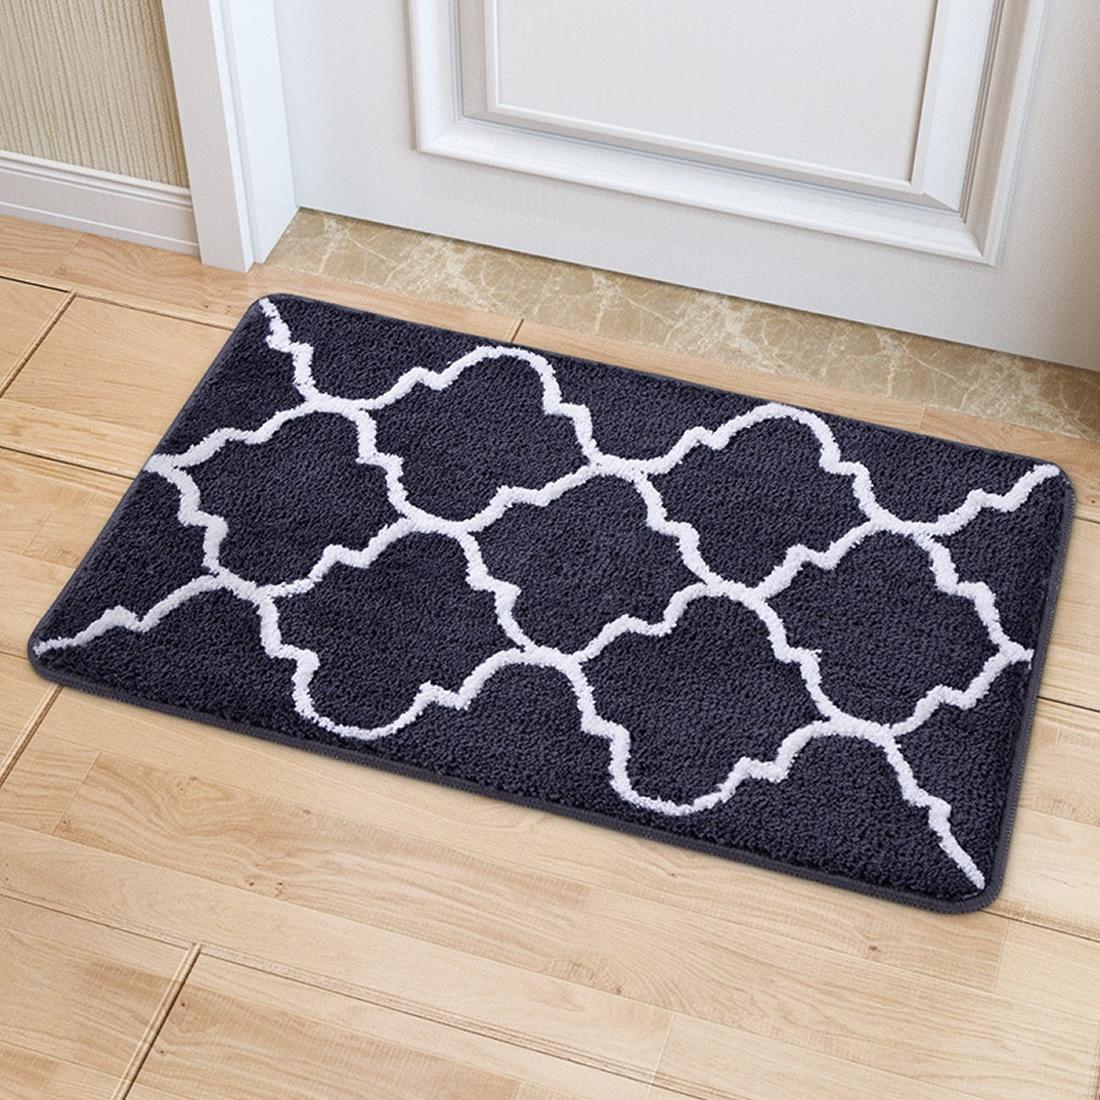 Geometric Figure Carpet Area Rug For Bedroom Living Room Carpet Kitchen Baths Mat Door Mat Anti-Slip Home Decoration